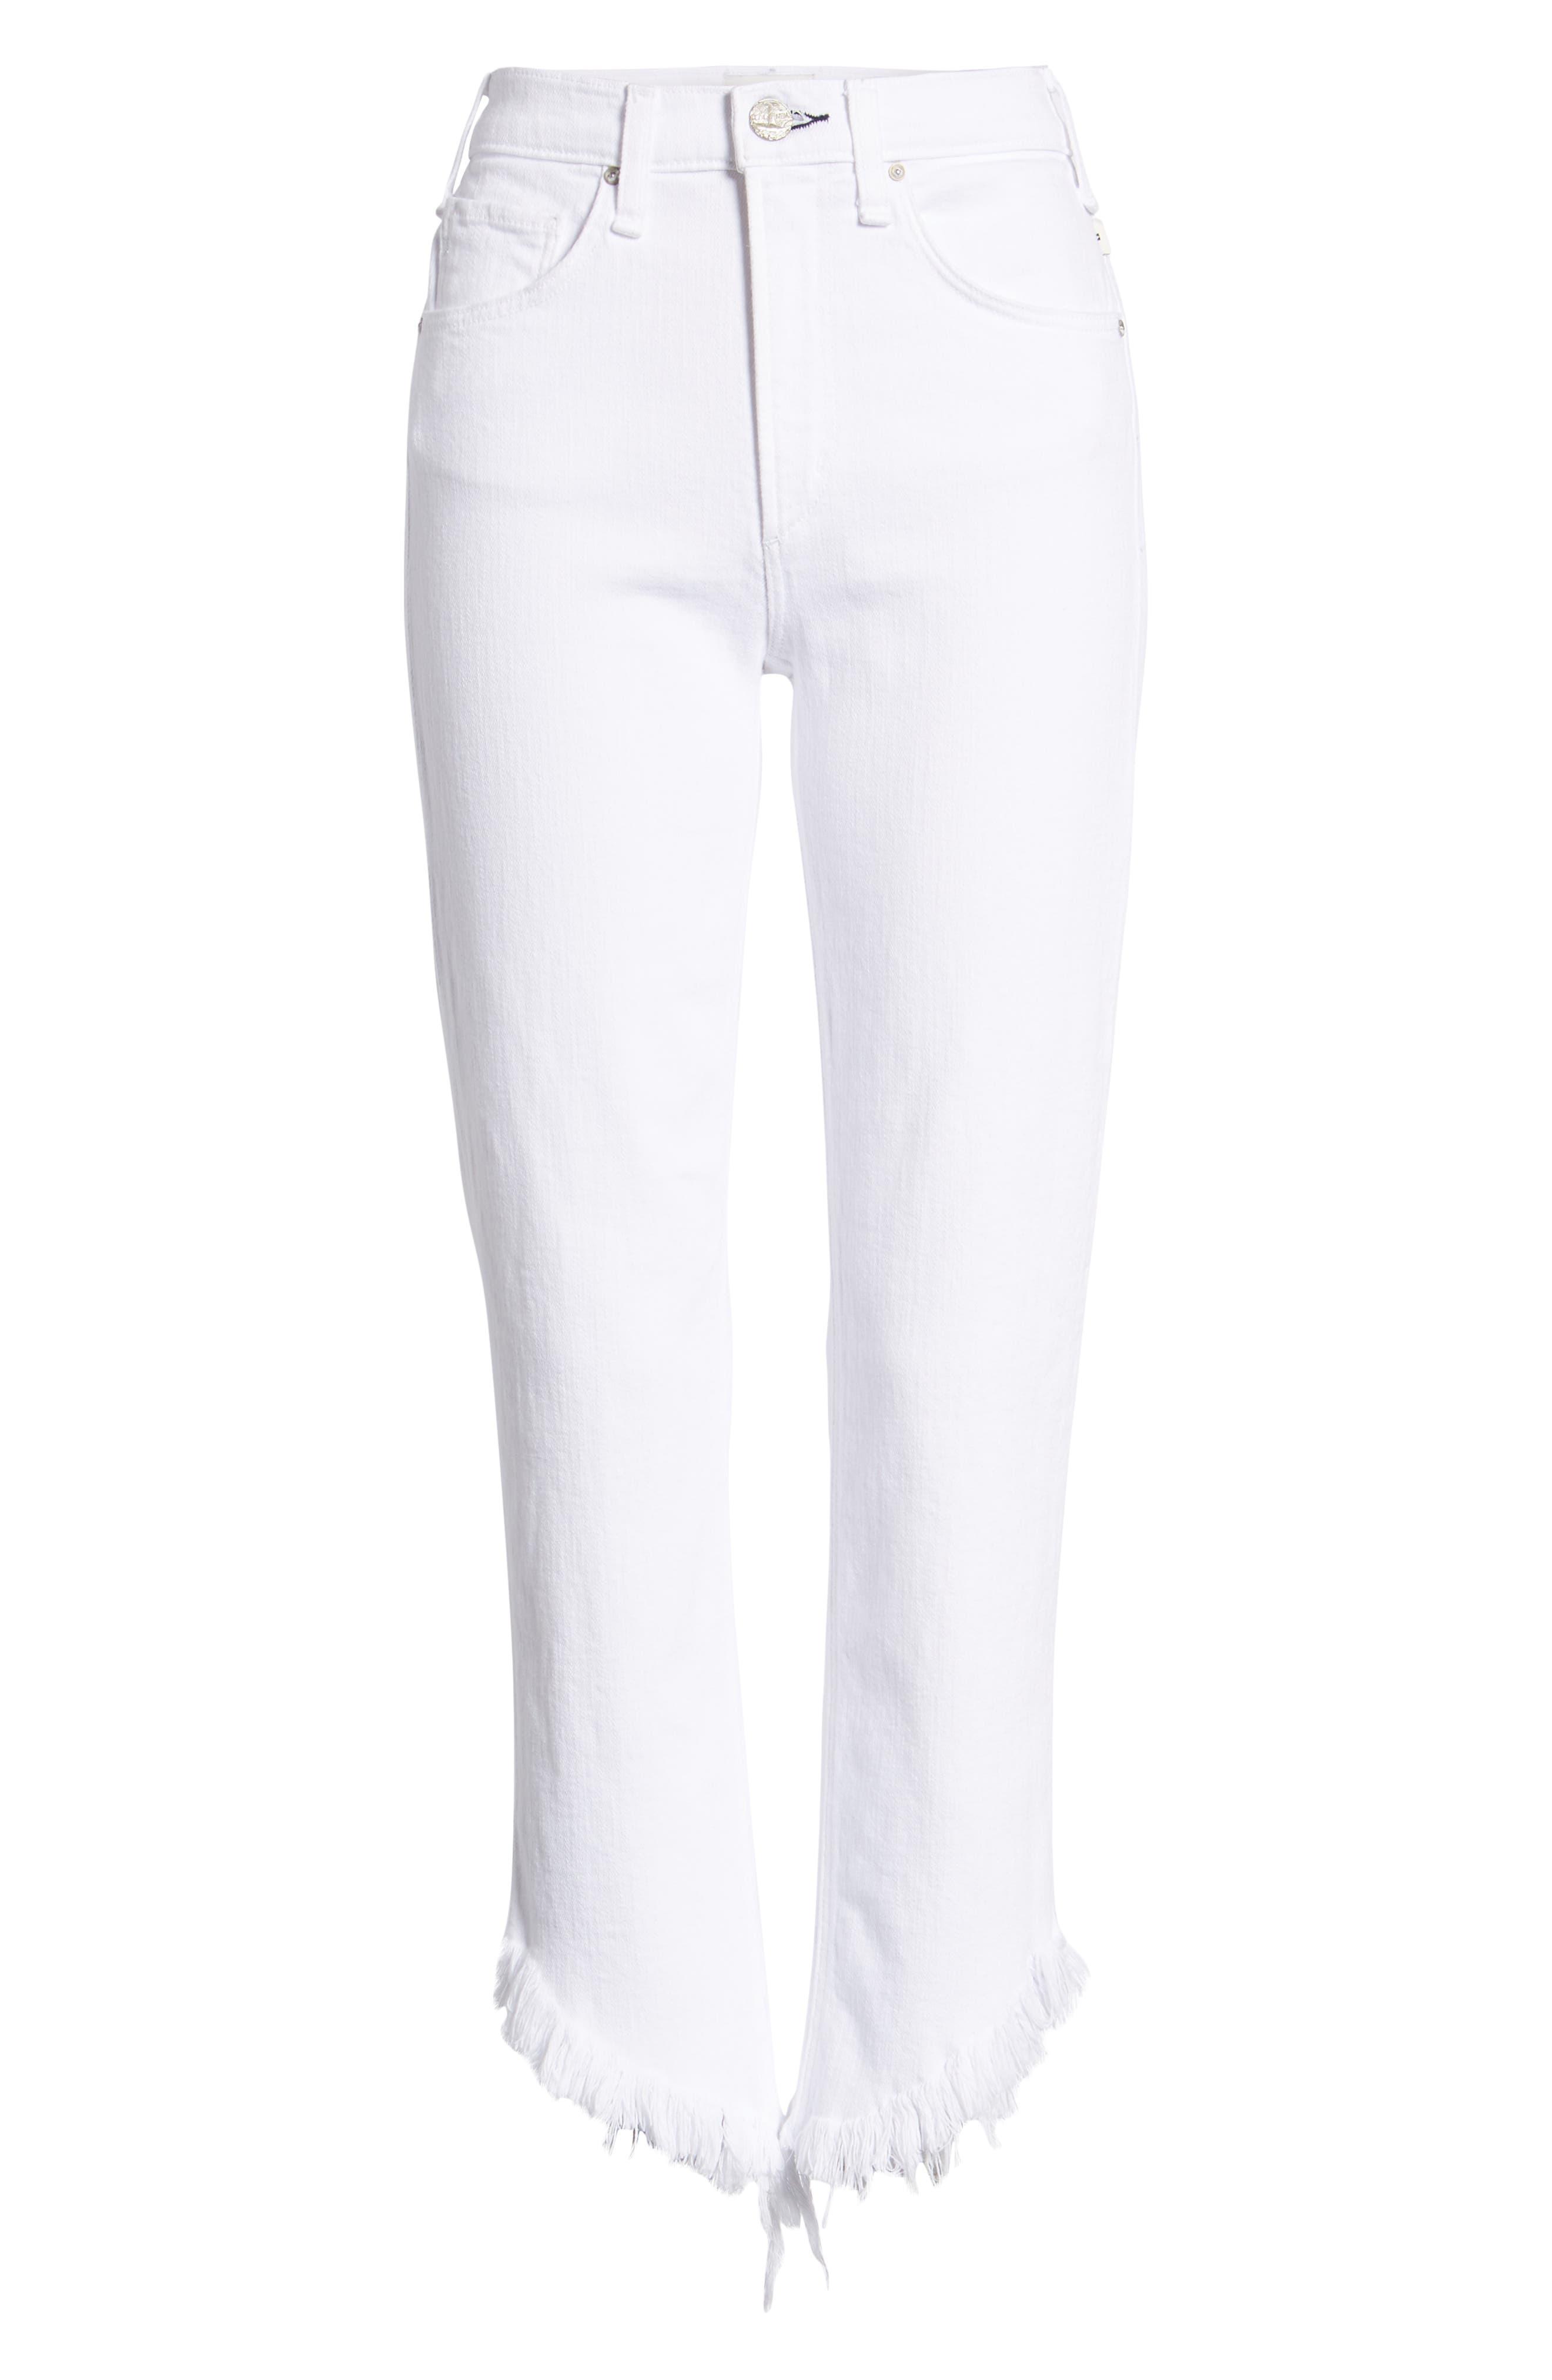 Valletta High Waist Crop Straight Leg Jeans,                             Alternate thumbnail 7, color,                             100